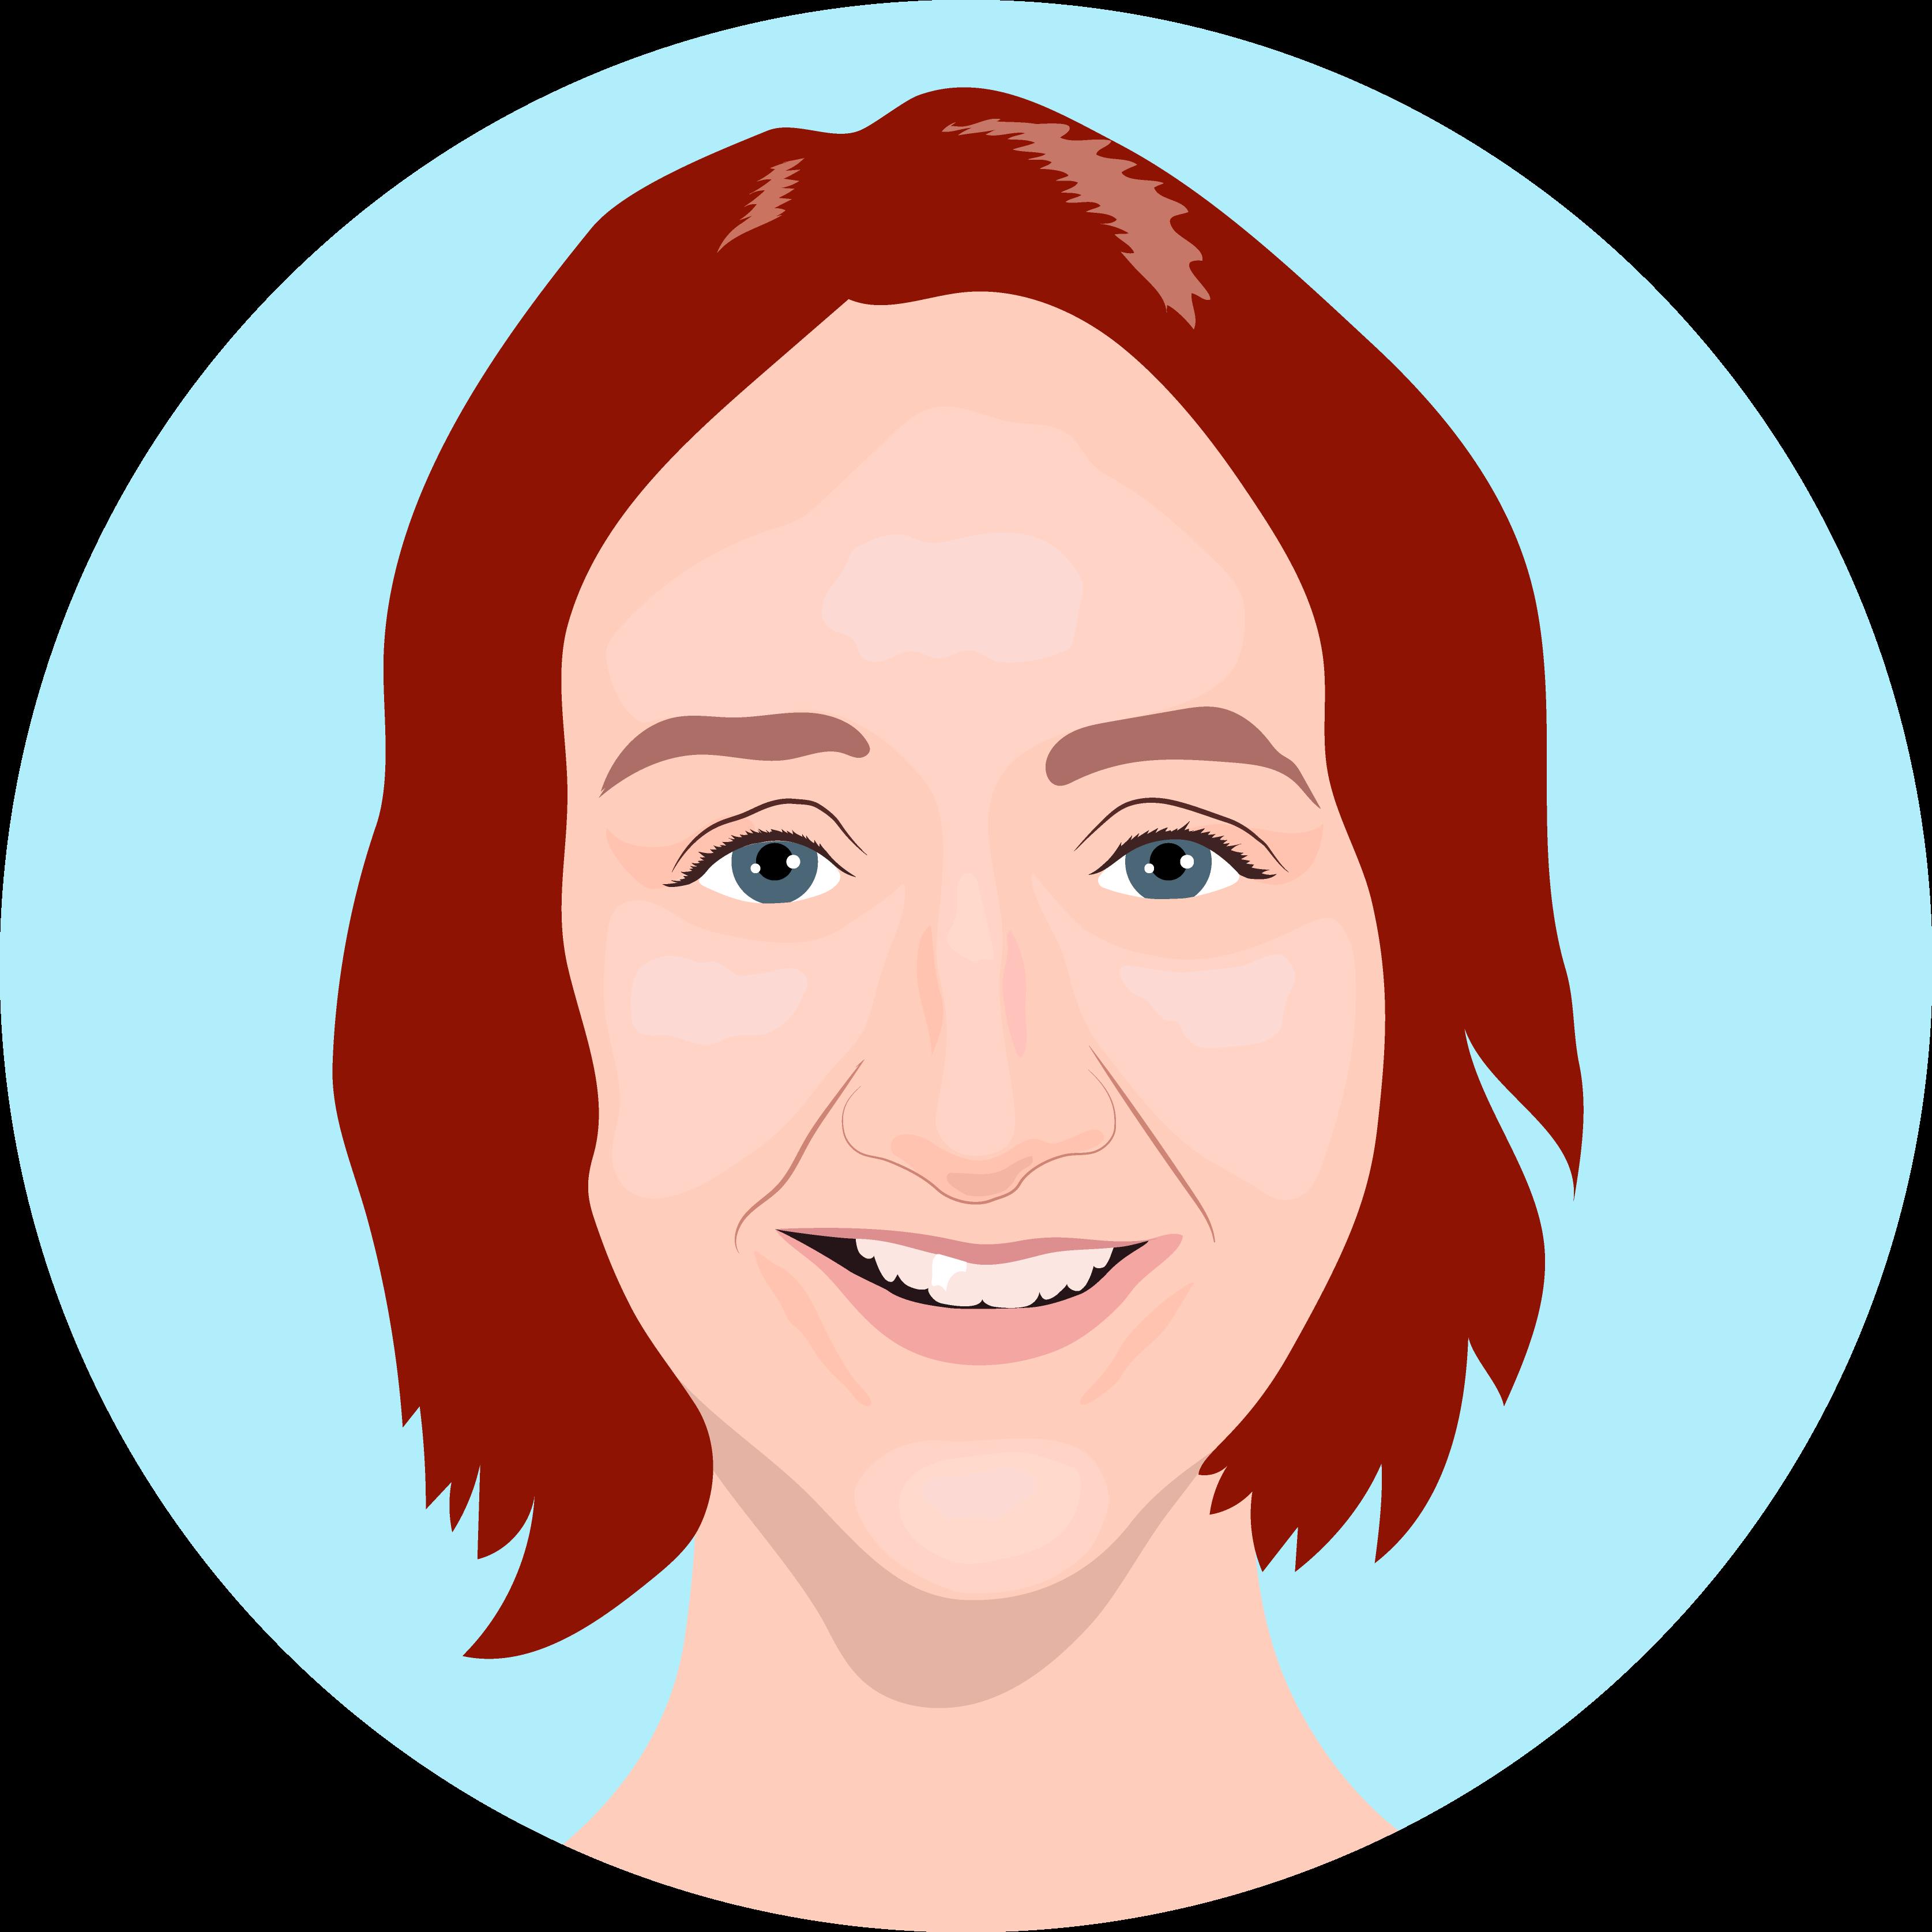 Animated photo of Psoda member Rhona Aylward